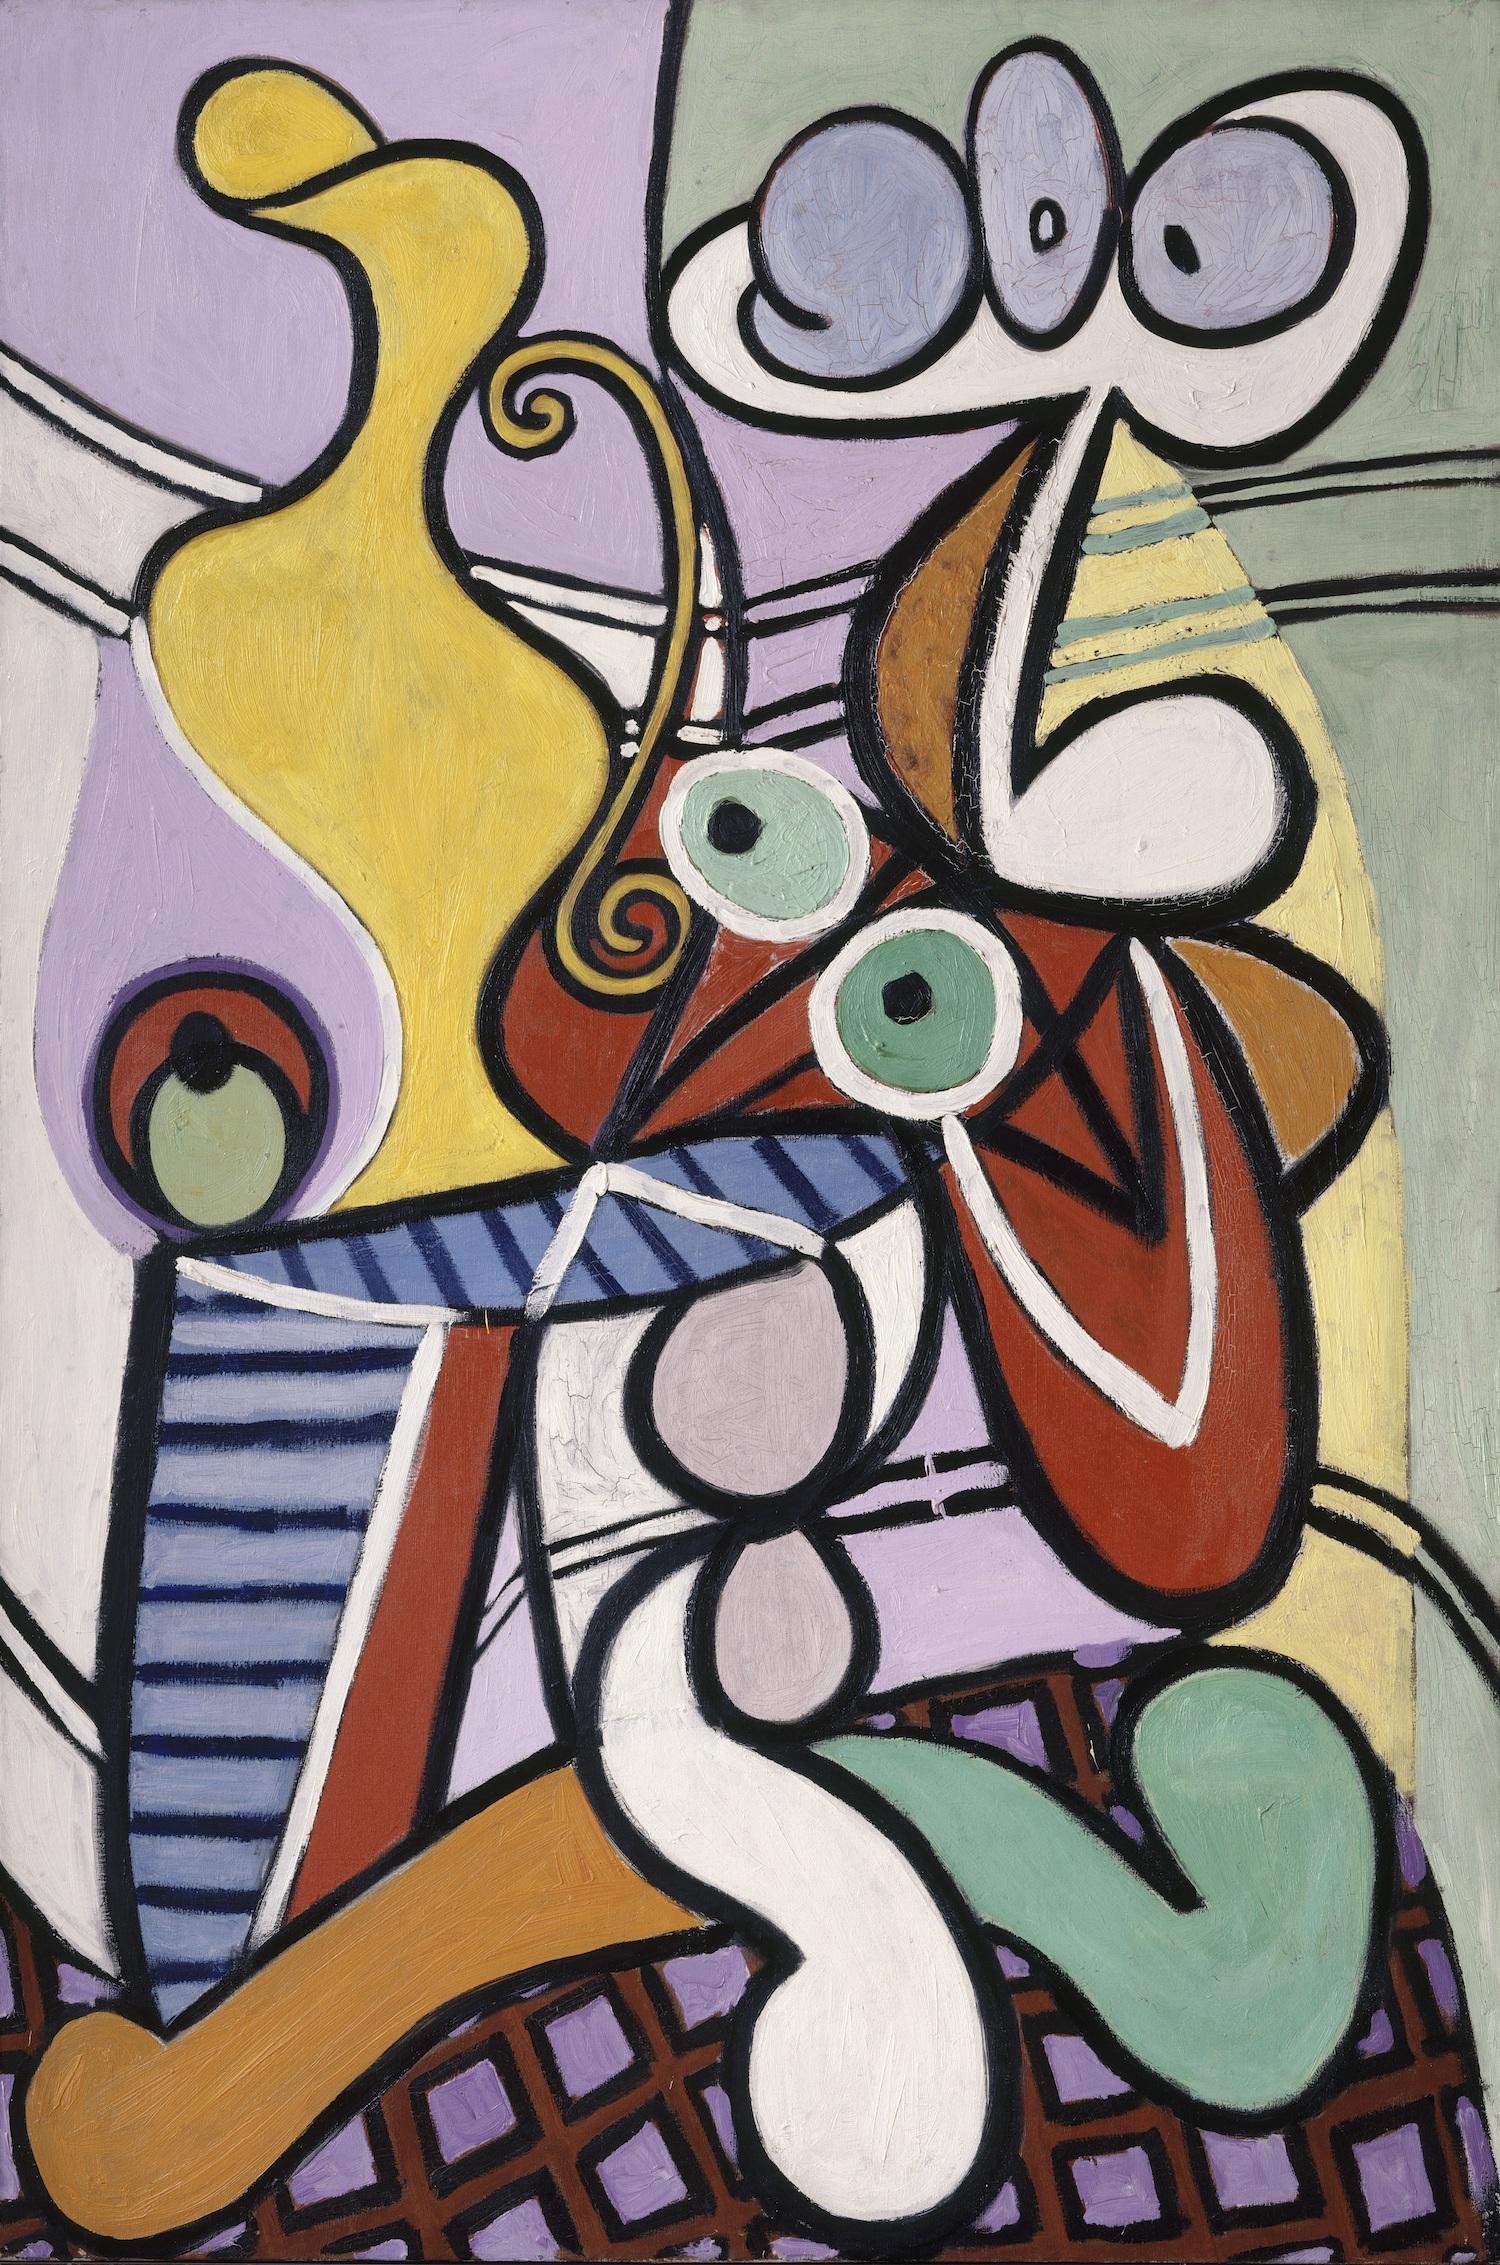 Pablo Picasso, Large Still Life with Pedestal Table, 1931, Musée Picasso, Paris, France.